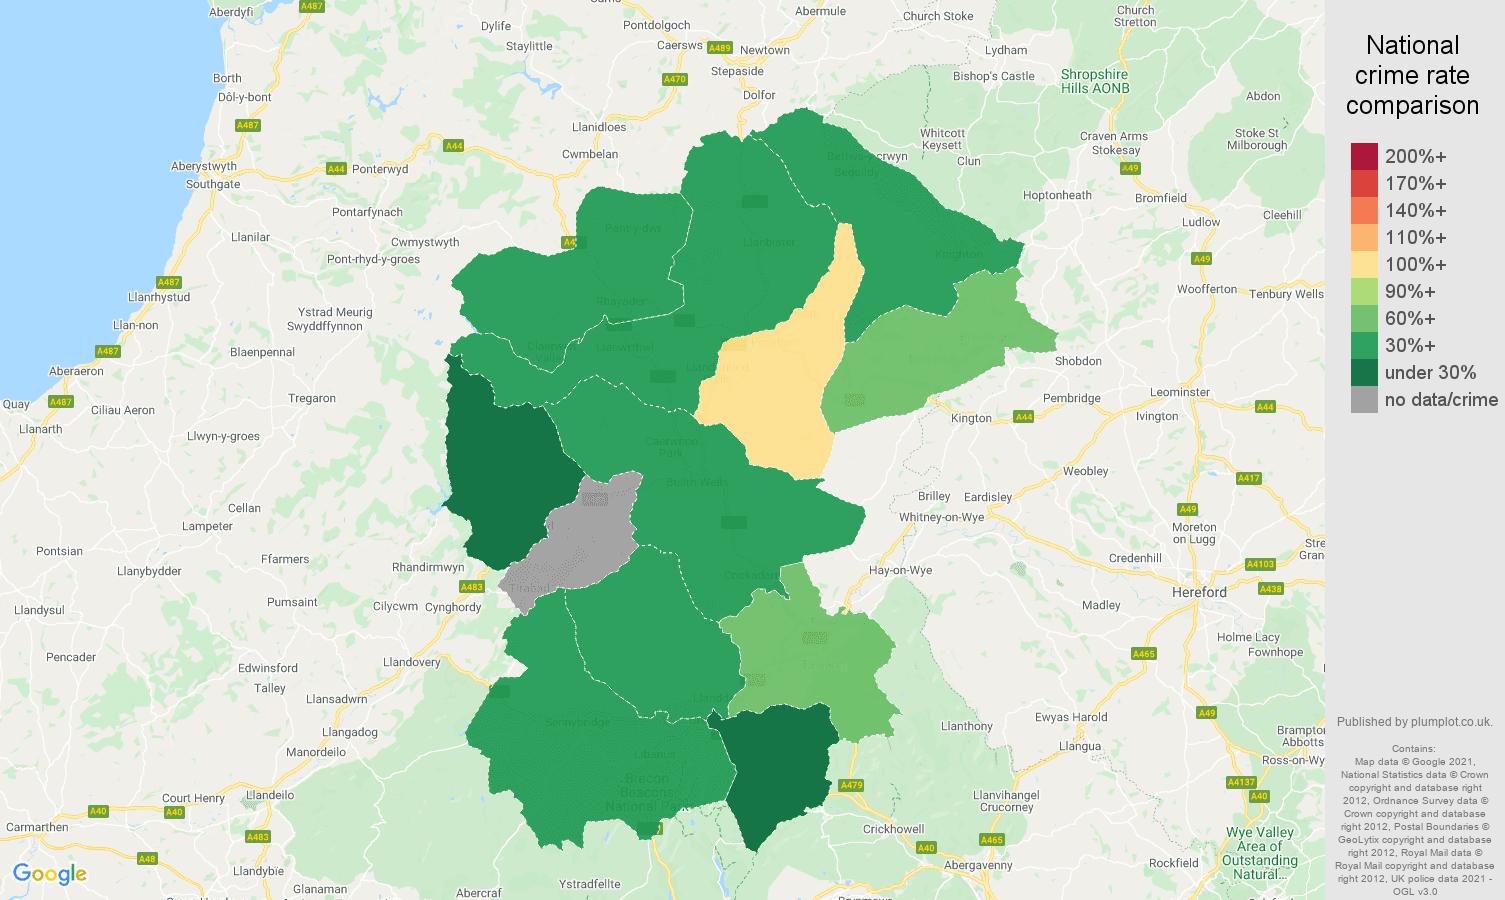 Llandrindod Wells burglary crime rate comparison map